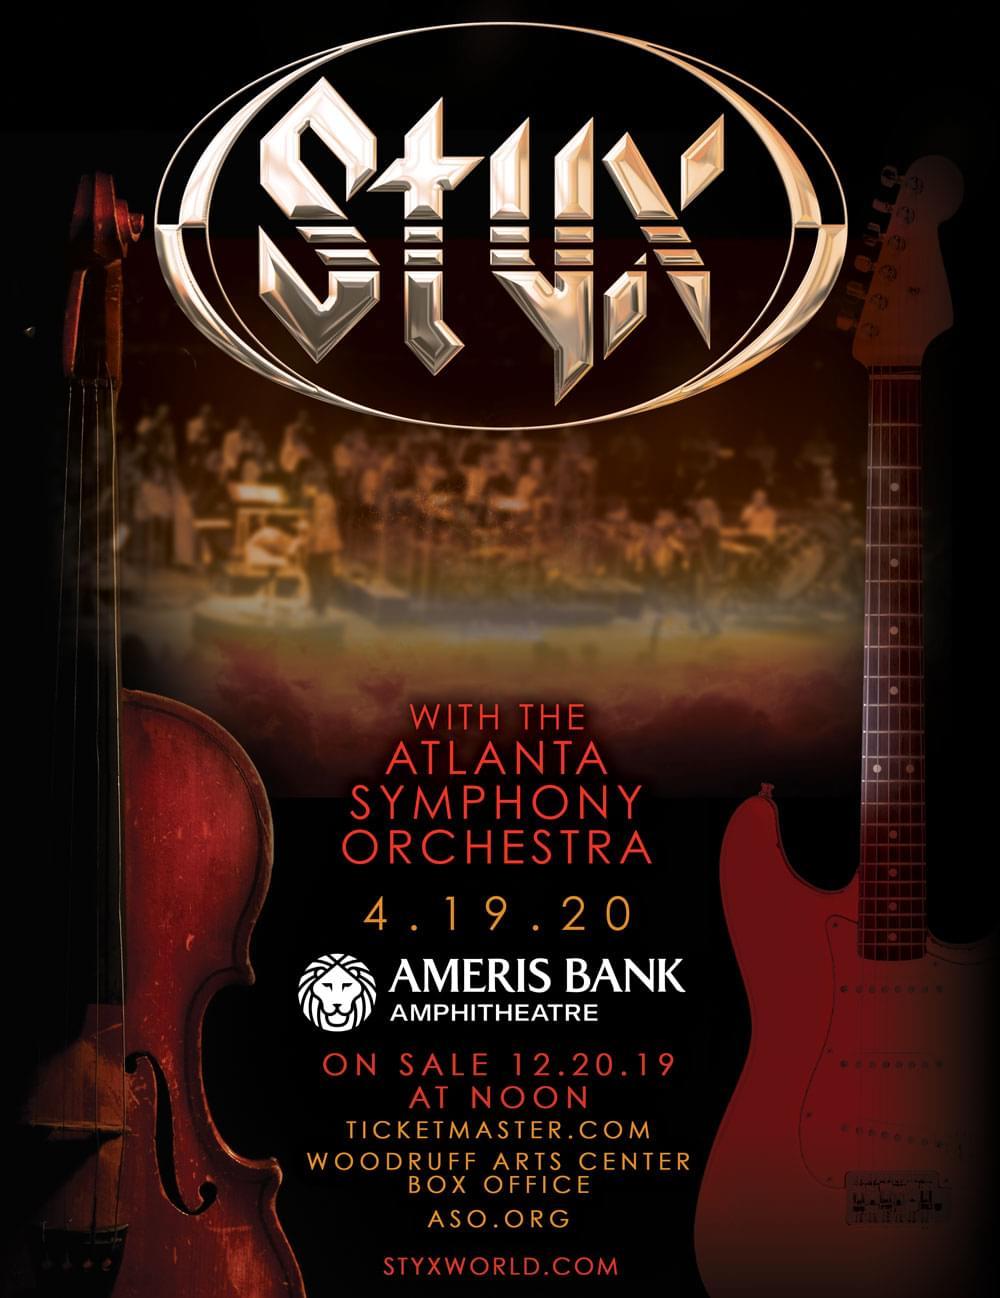 APRIL 19 – Styx – With The Atlanta Symphony Orchestra